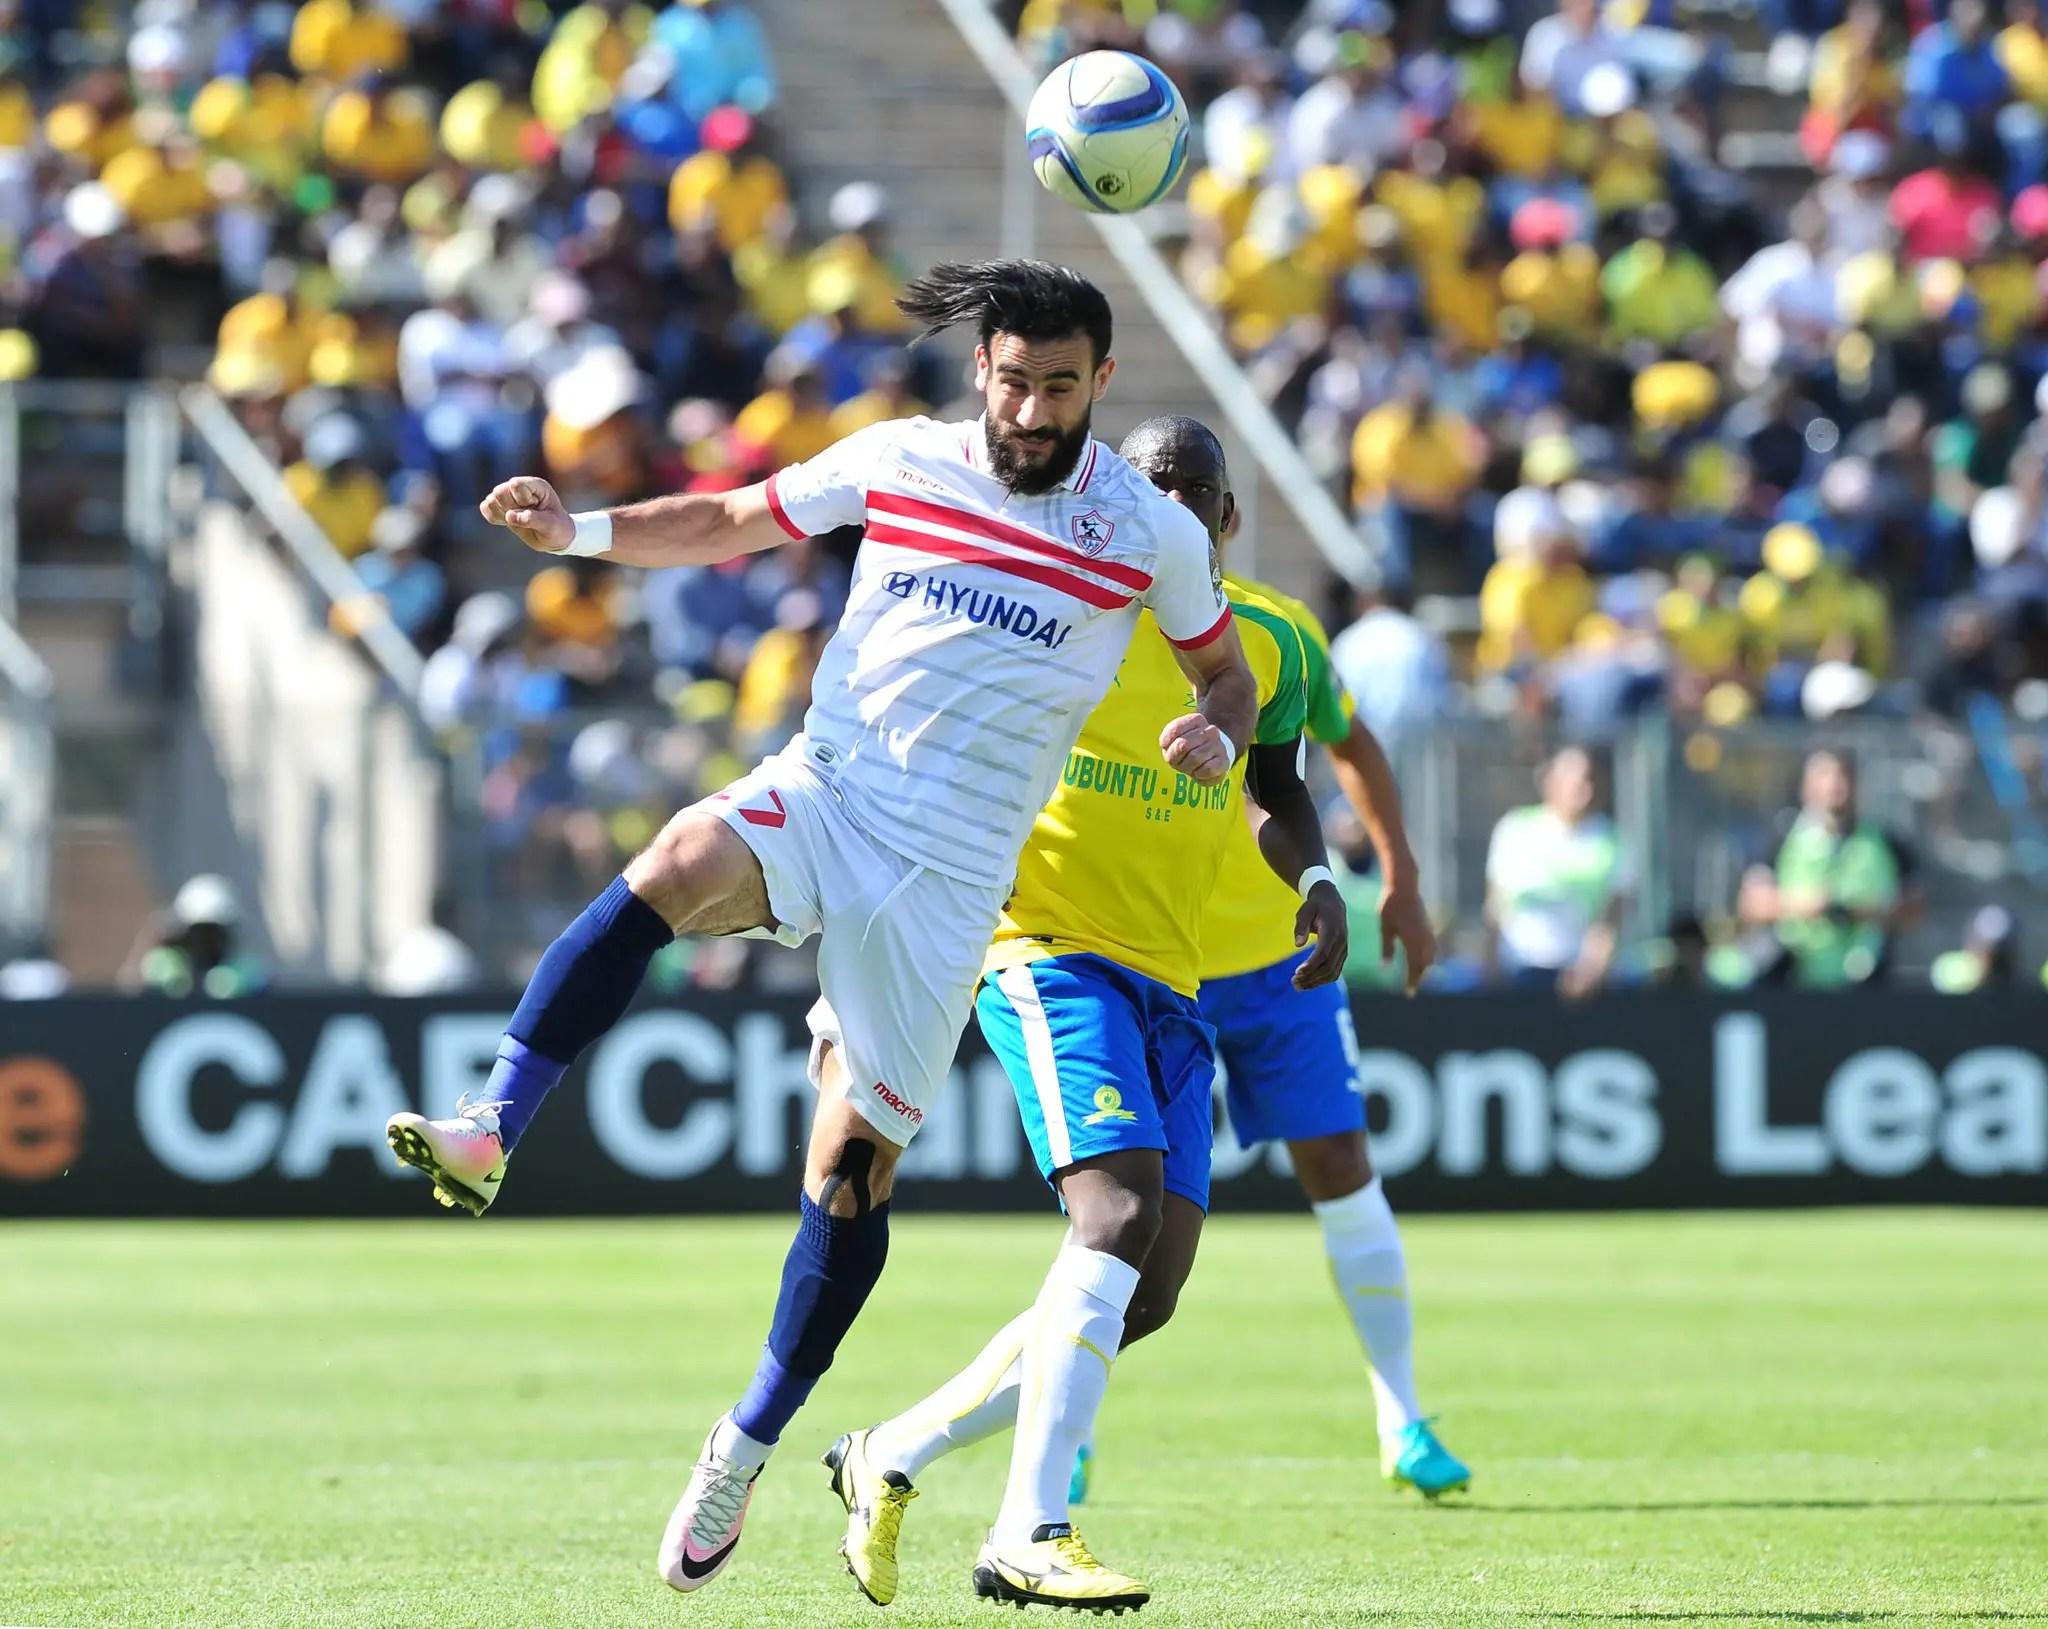 Mamelodi Sundowns Thrash Zamalek, Close To CAFCL Title